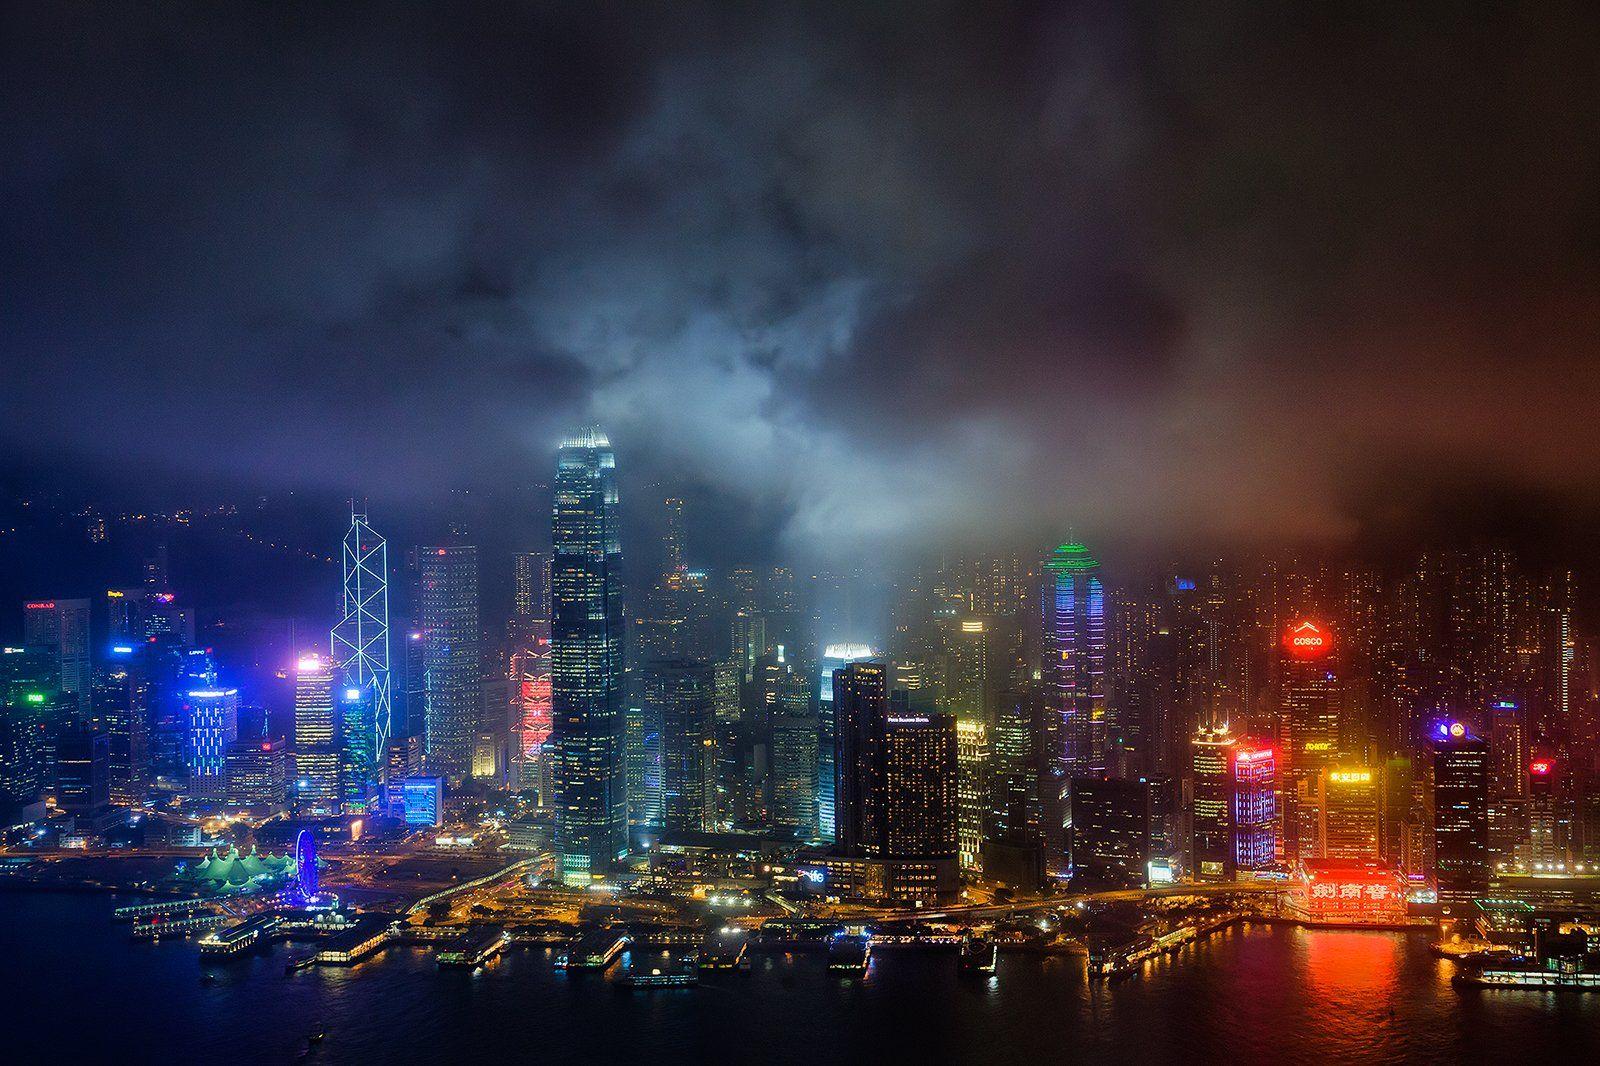 Гонконг, Китай, небоскреб, вечер, тучи, цвет, Бирюков Юрий